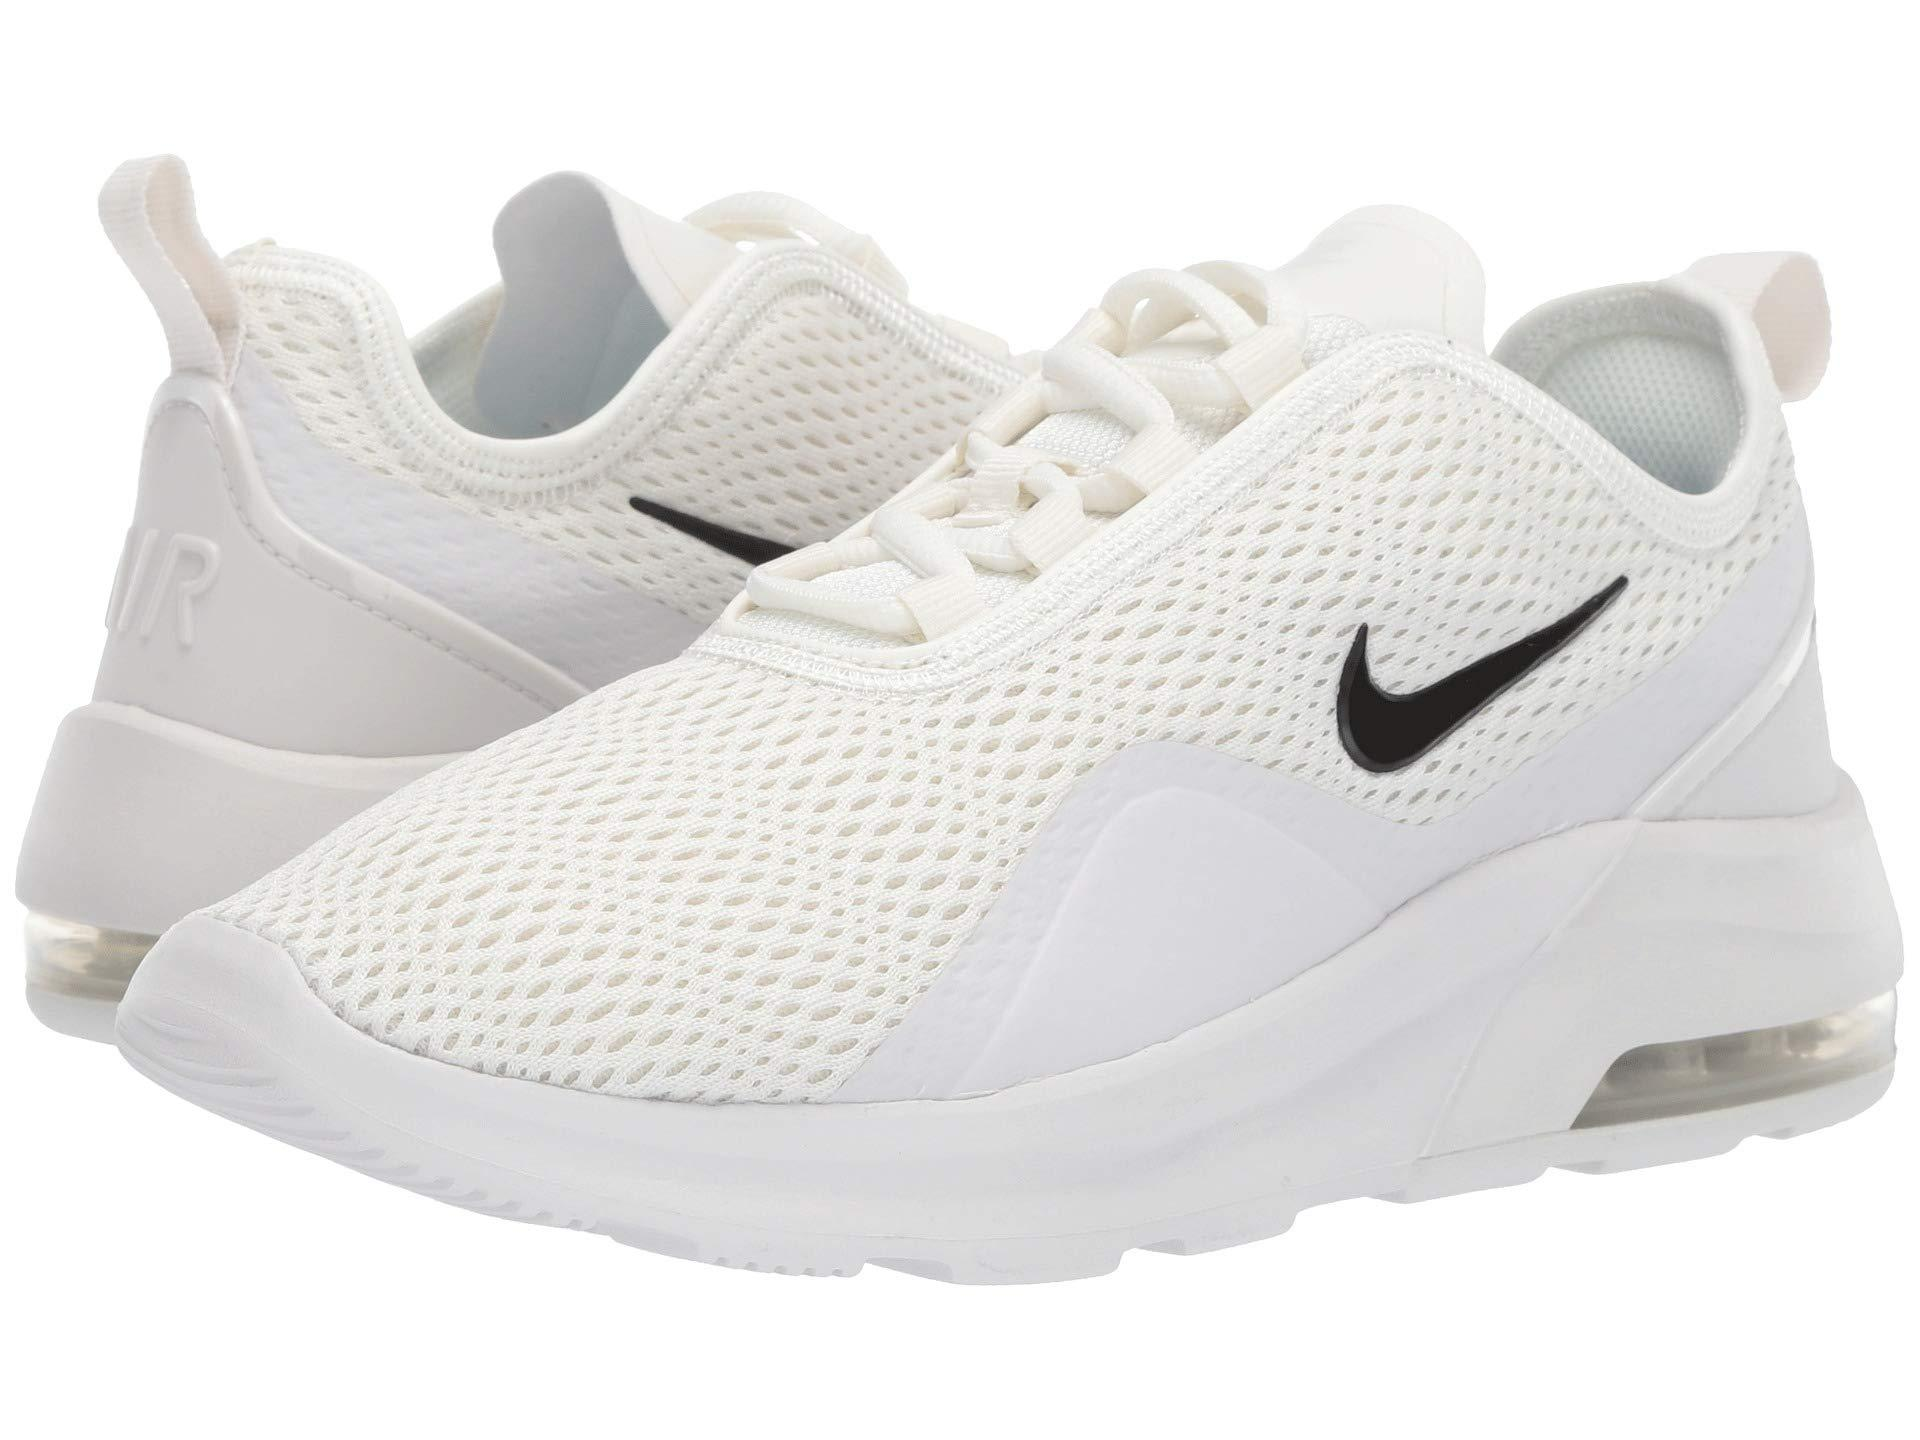 cac7b9a89e4b2 Lyst - Nike Air Max Motion 2 (vast Grey black teal Tint) Women s ...